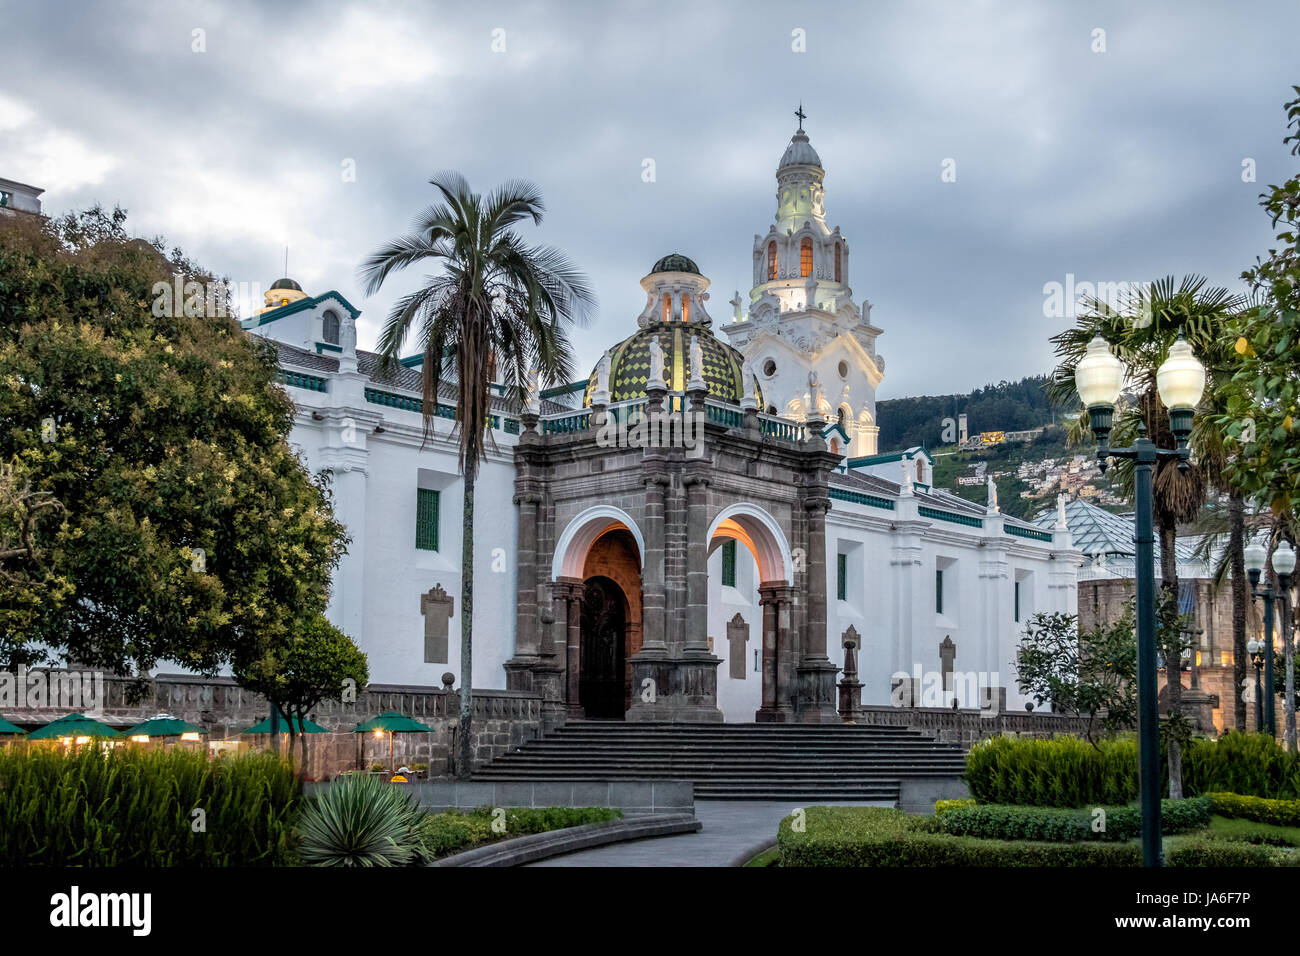 Plaza Grande and Metropolitan Cathedral - Quito, Ecuador - Stock Image